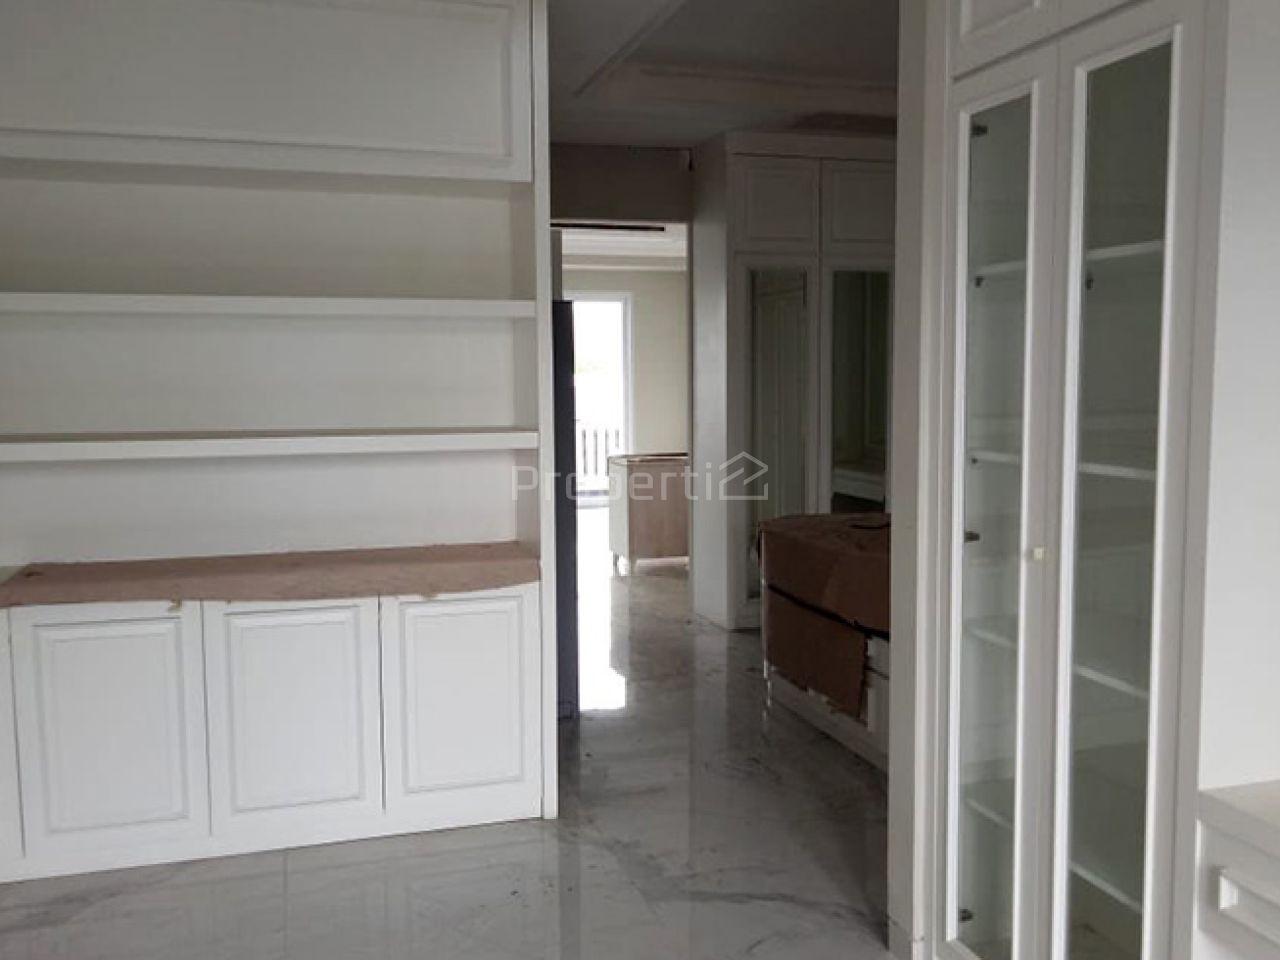 Rumah Baru 3 Lantai di Tengah Kota Sekitar Mampang, DKI Jakarta